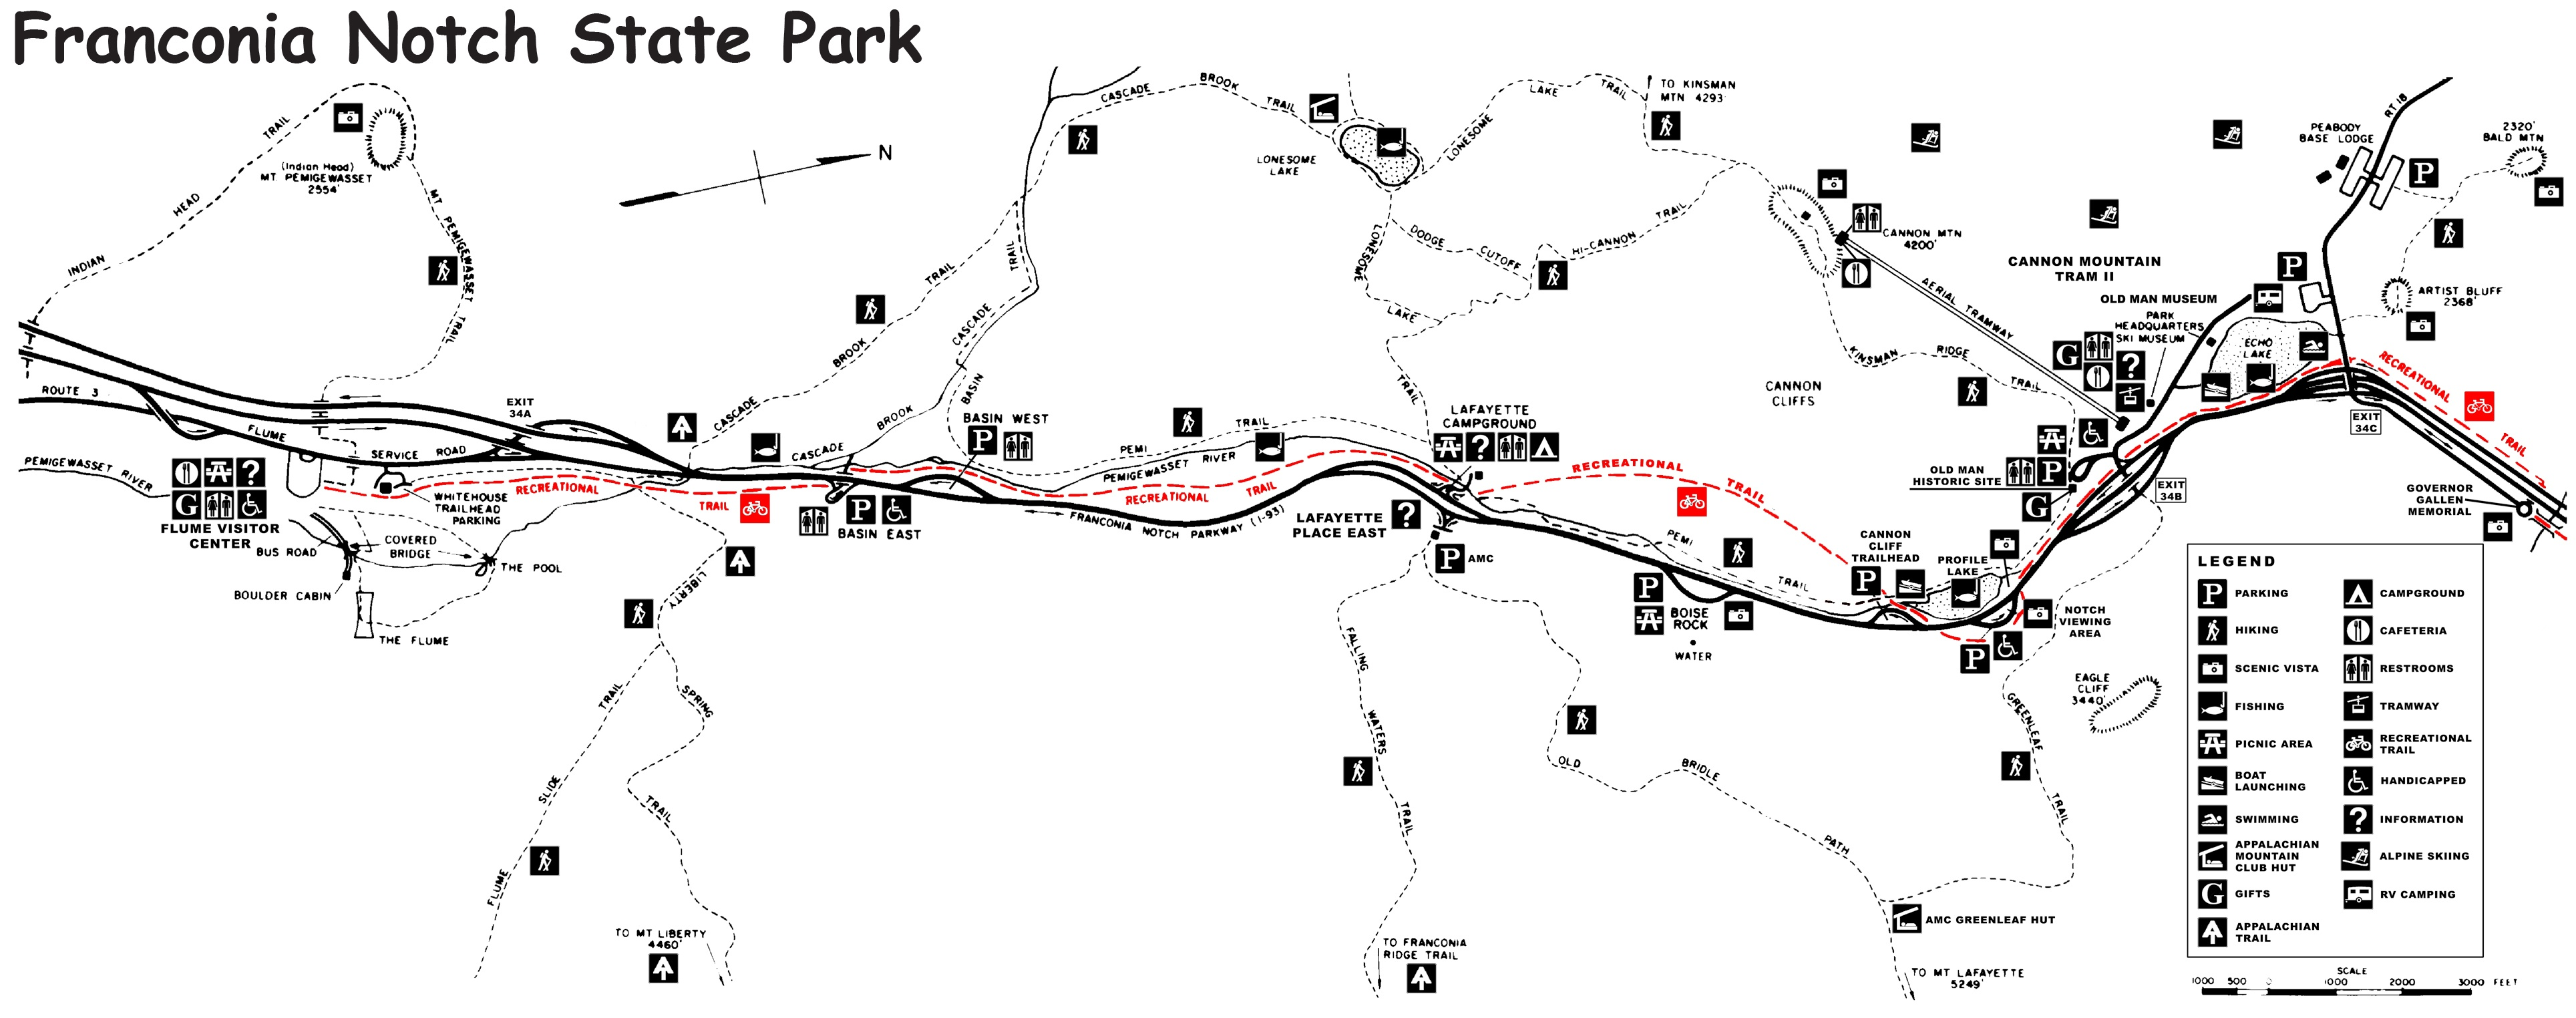 Franconia-Notch-Attractions-Map_Bike-Path.jpg